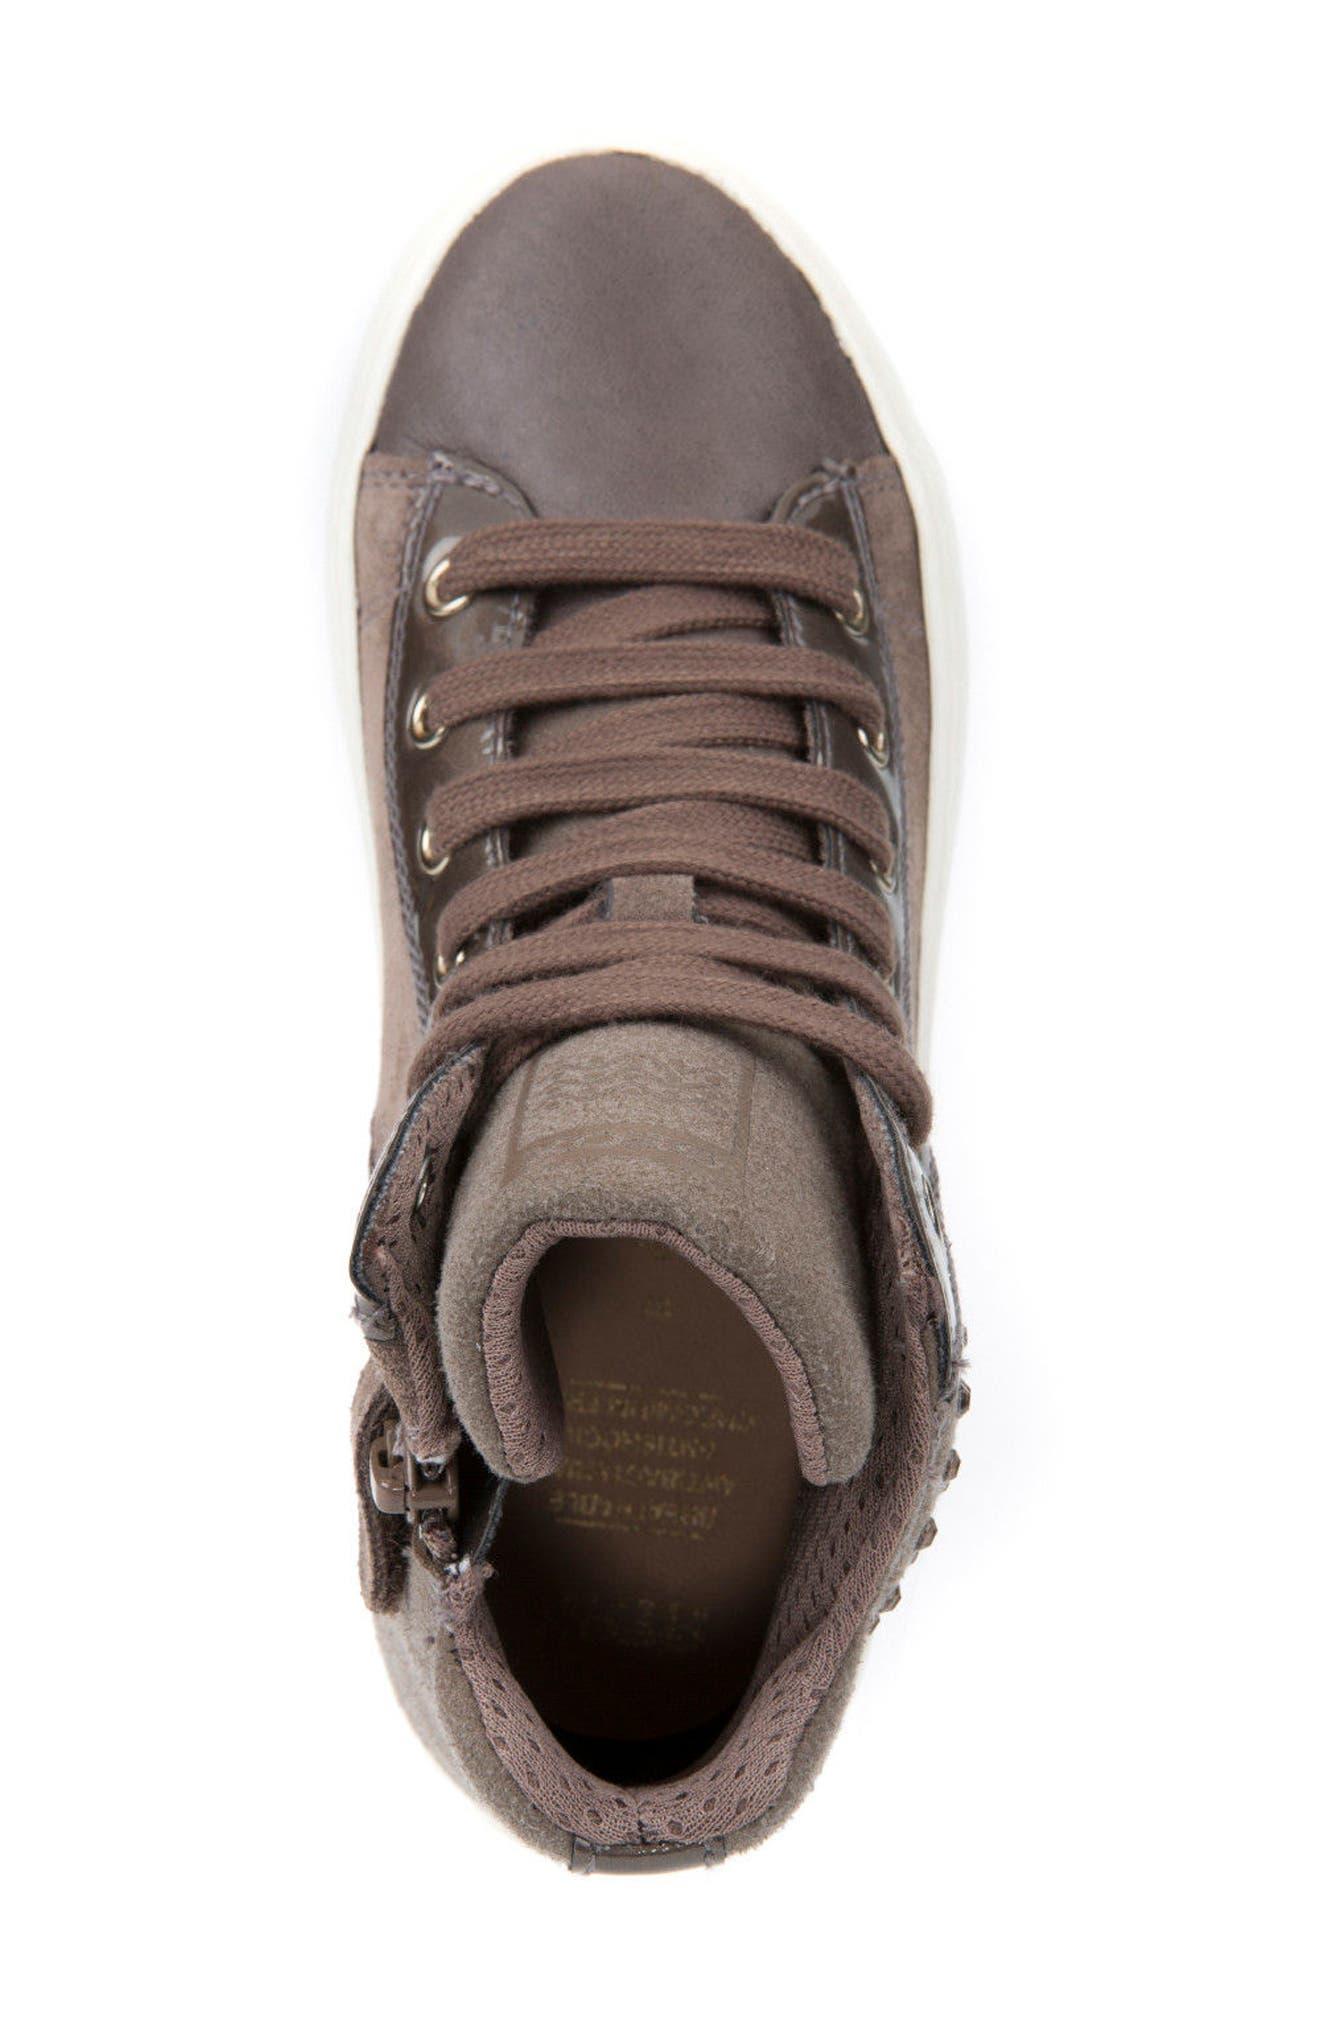 Kalispera Girl Embellished High Top Sneaker,                             Alternate thumbnail 6, color,                             Dark Beige